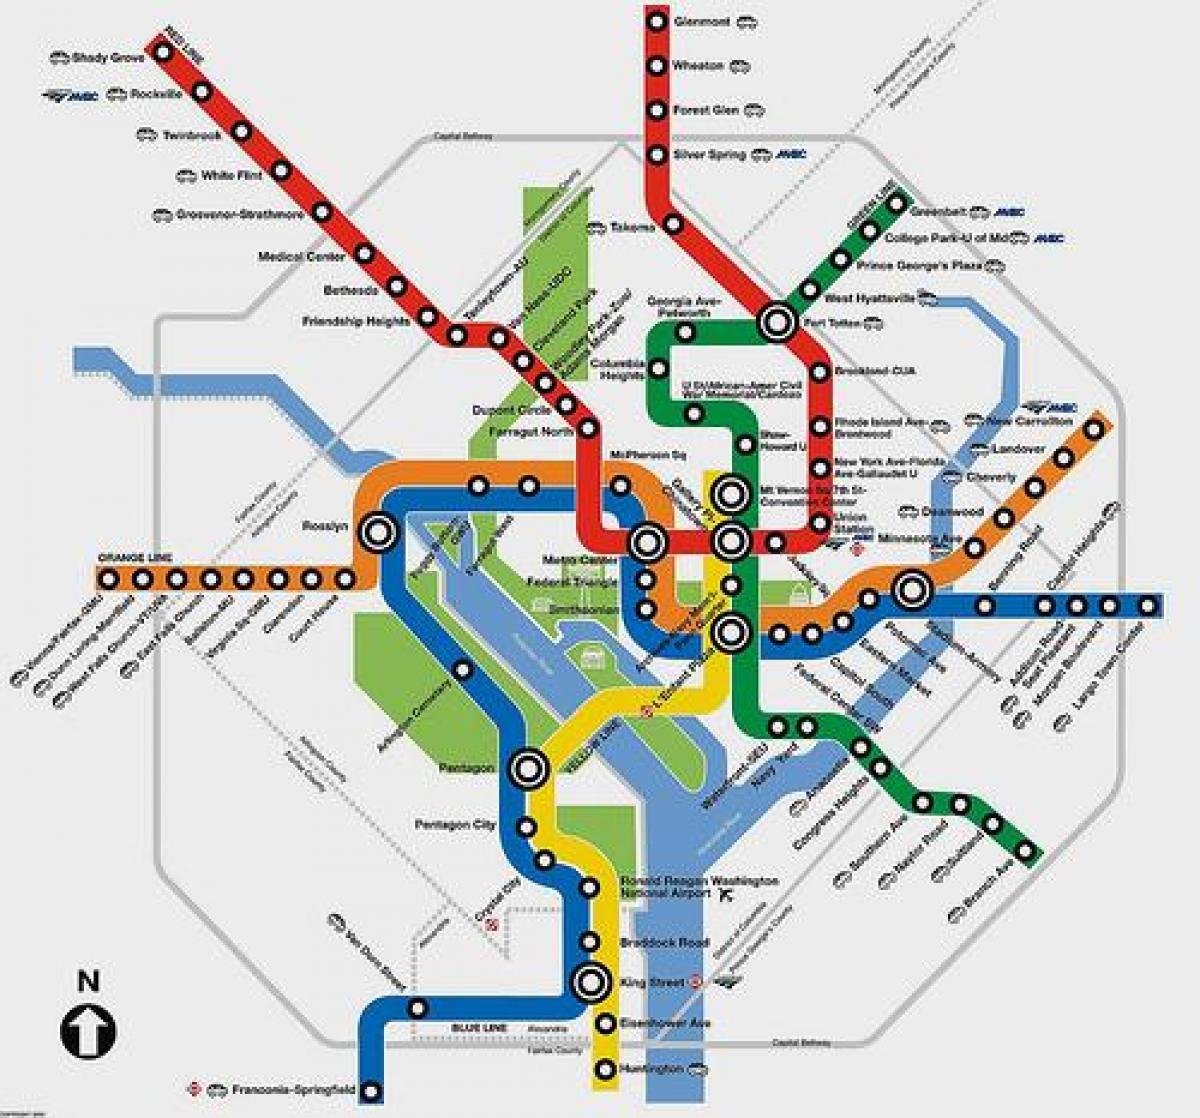 Metro Map Dc Trip Planner Metro map dc trip planner   Dc metro map planner (District of